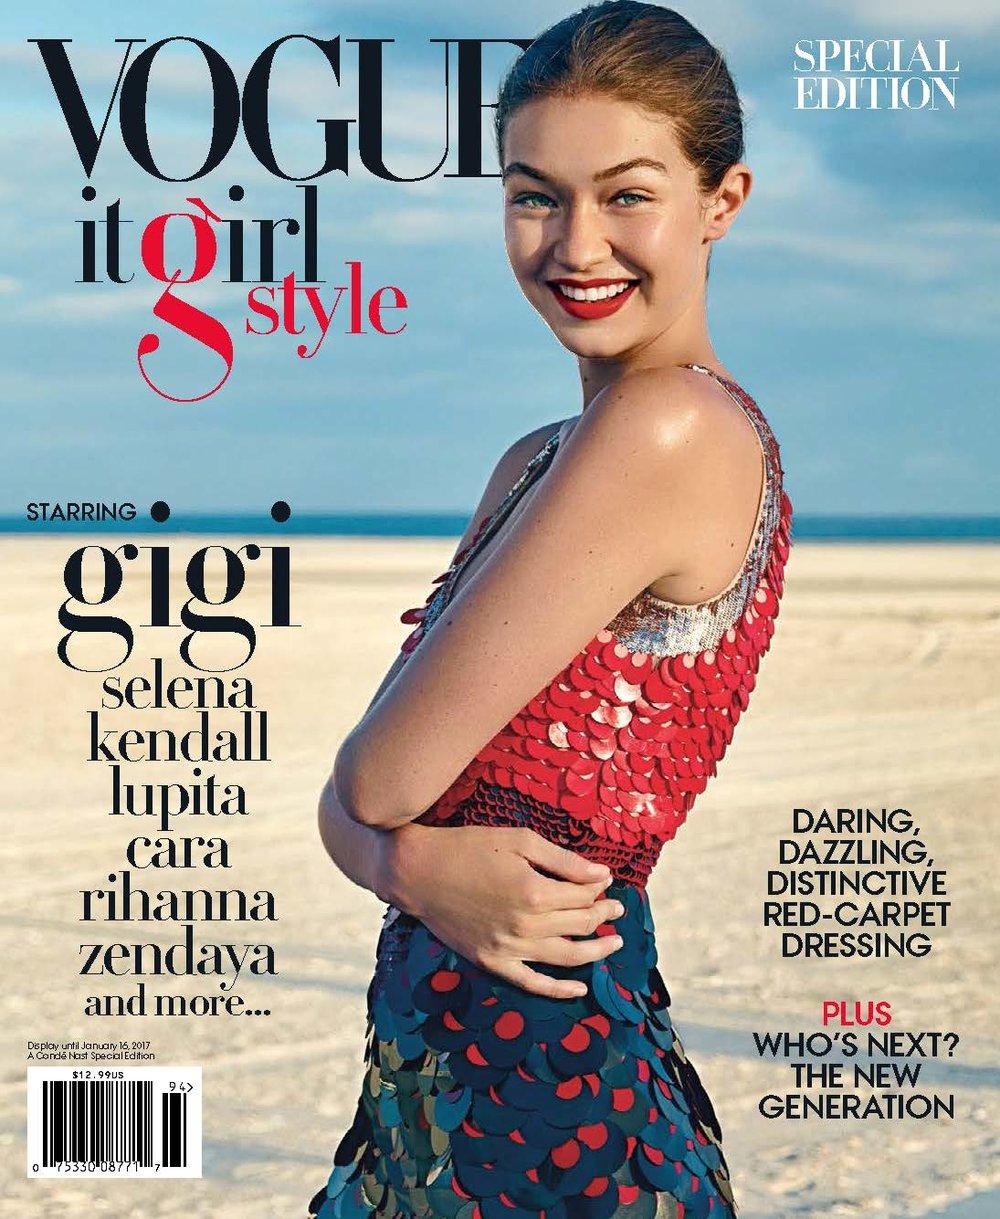 vogue__it_girl_style.jpg